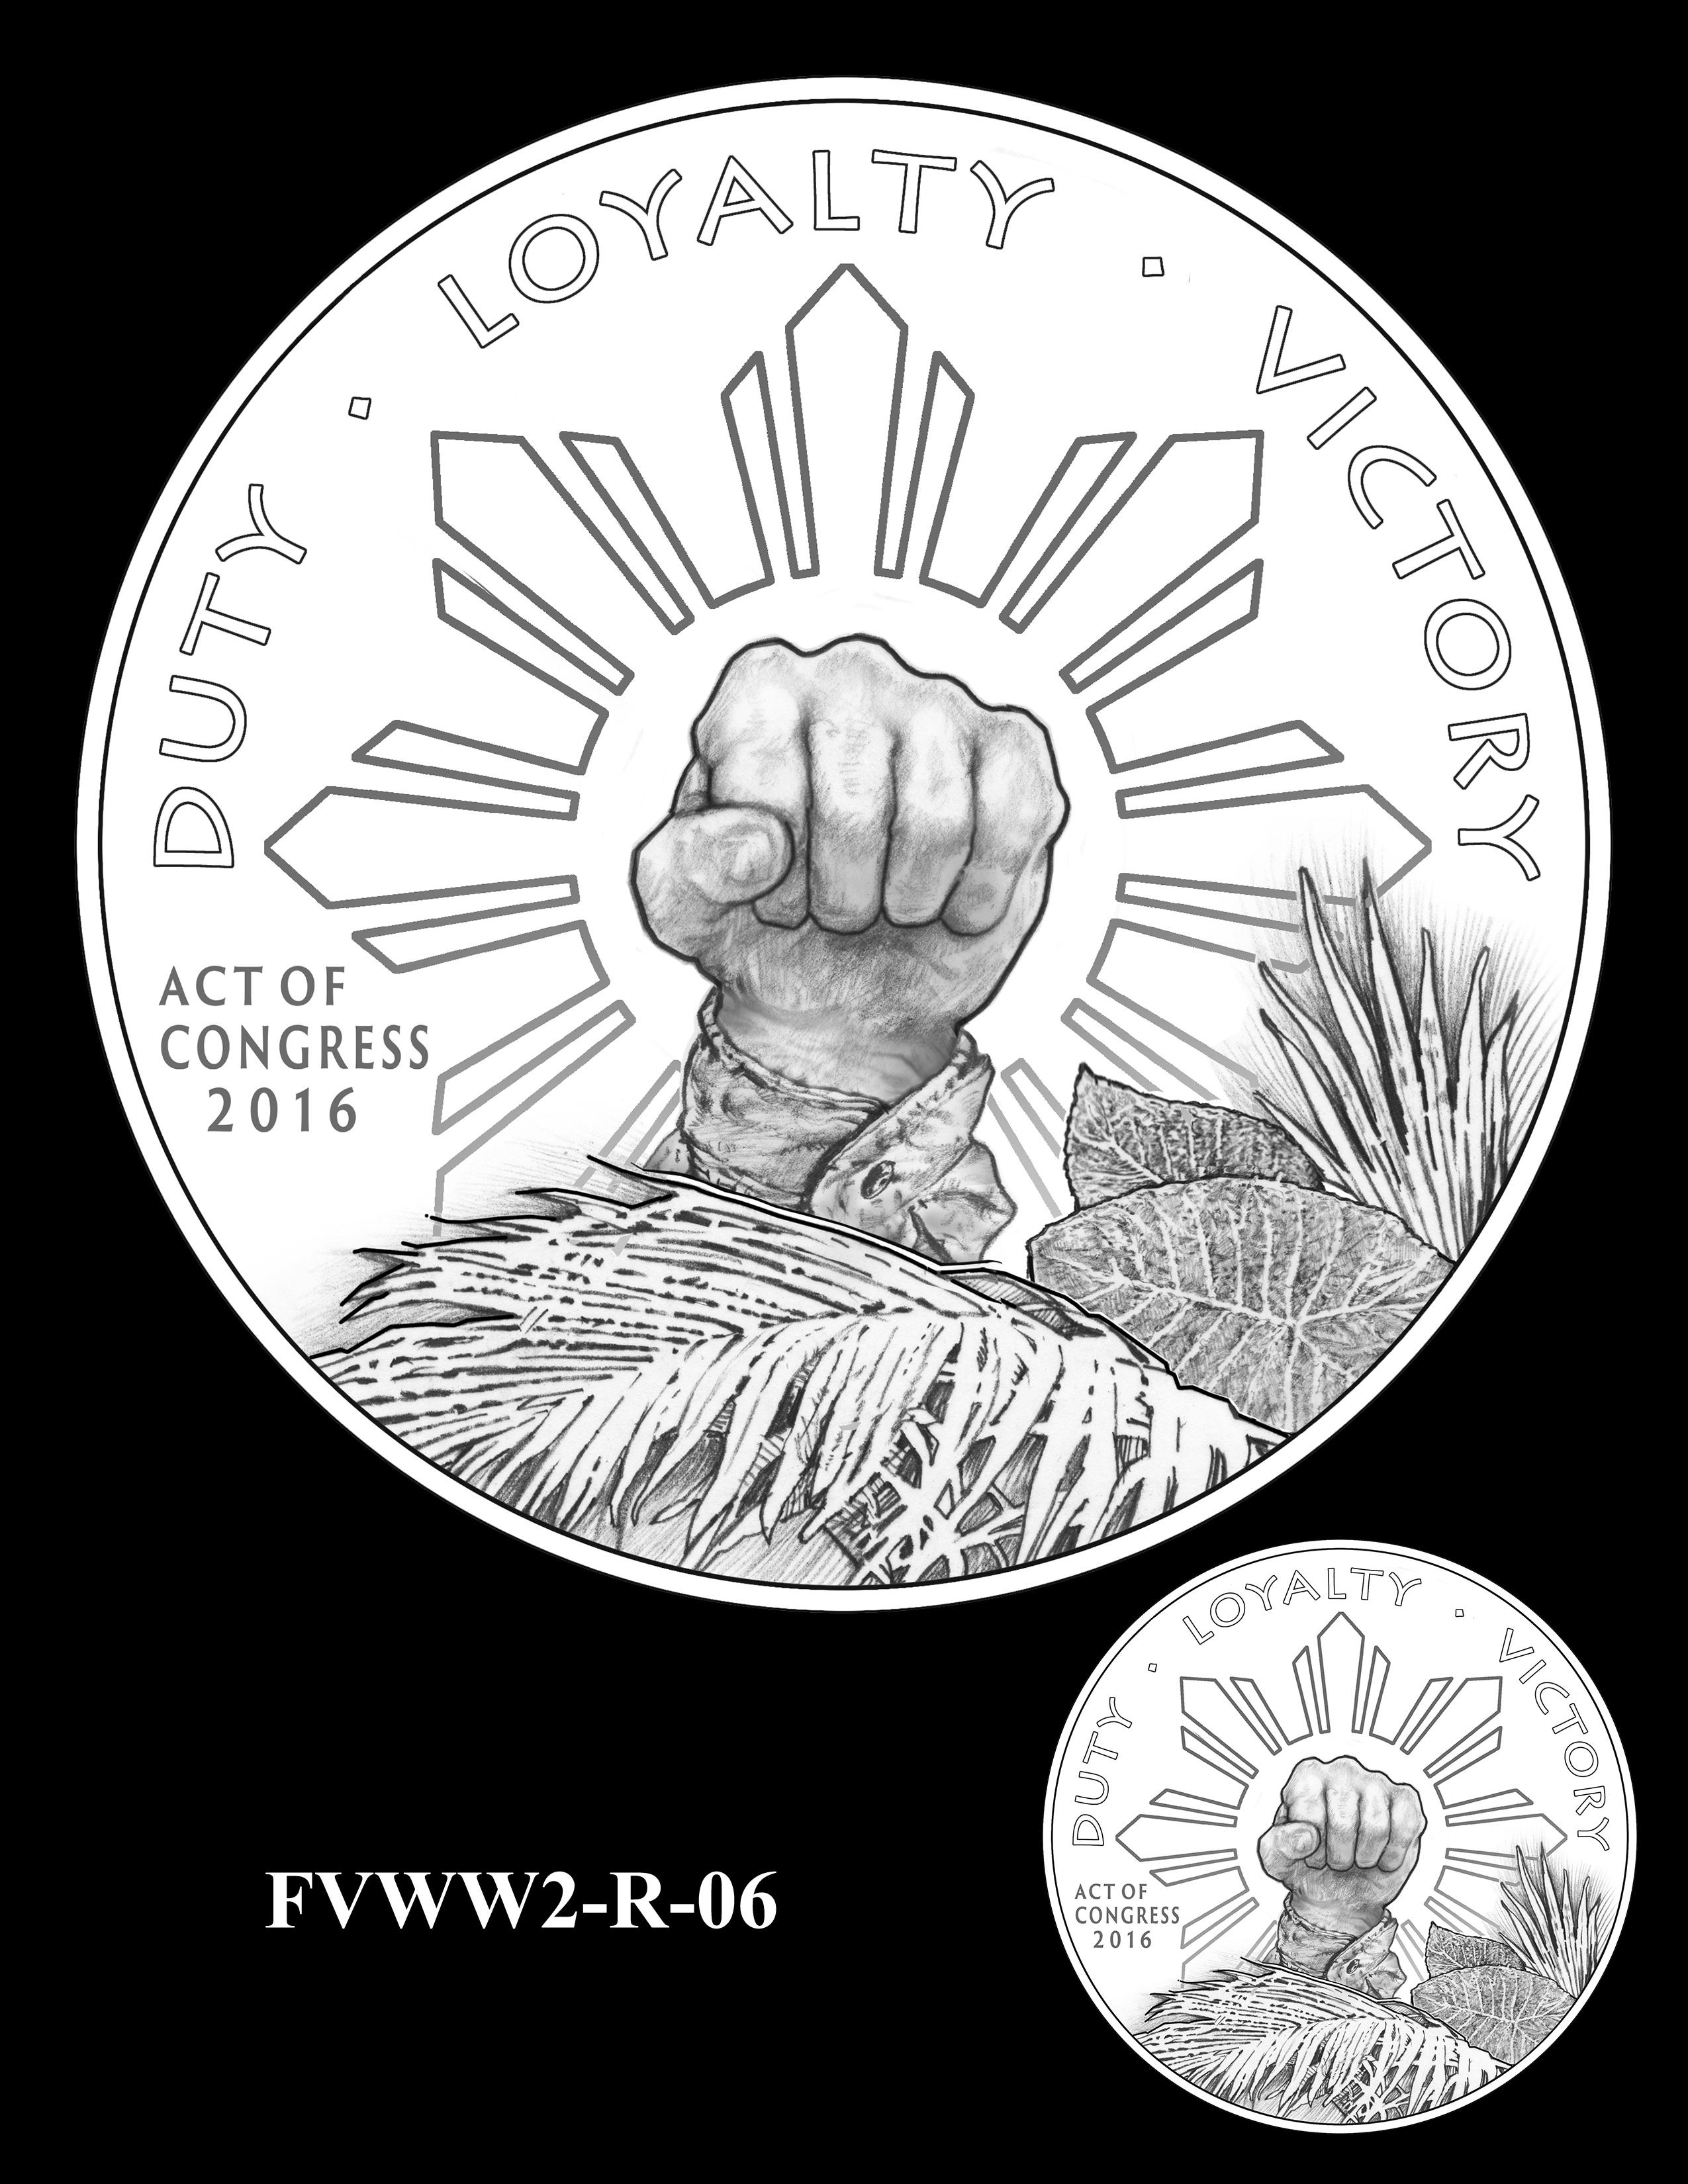 FVWW2-R-06 -- Filipino Veterans of World War II Congressional Gold Medal